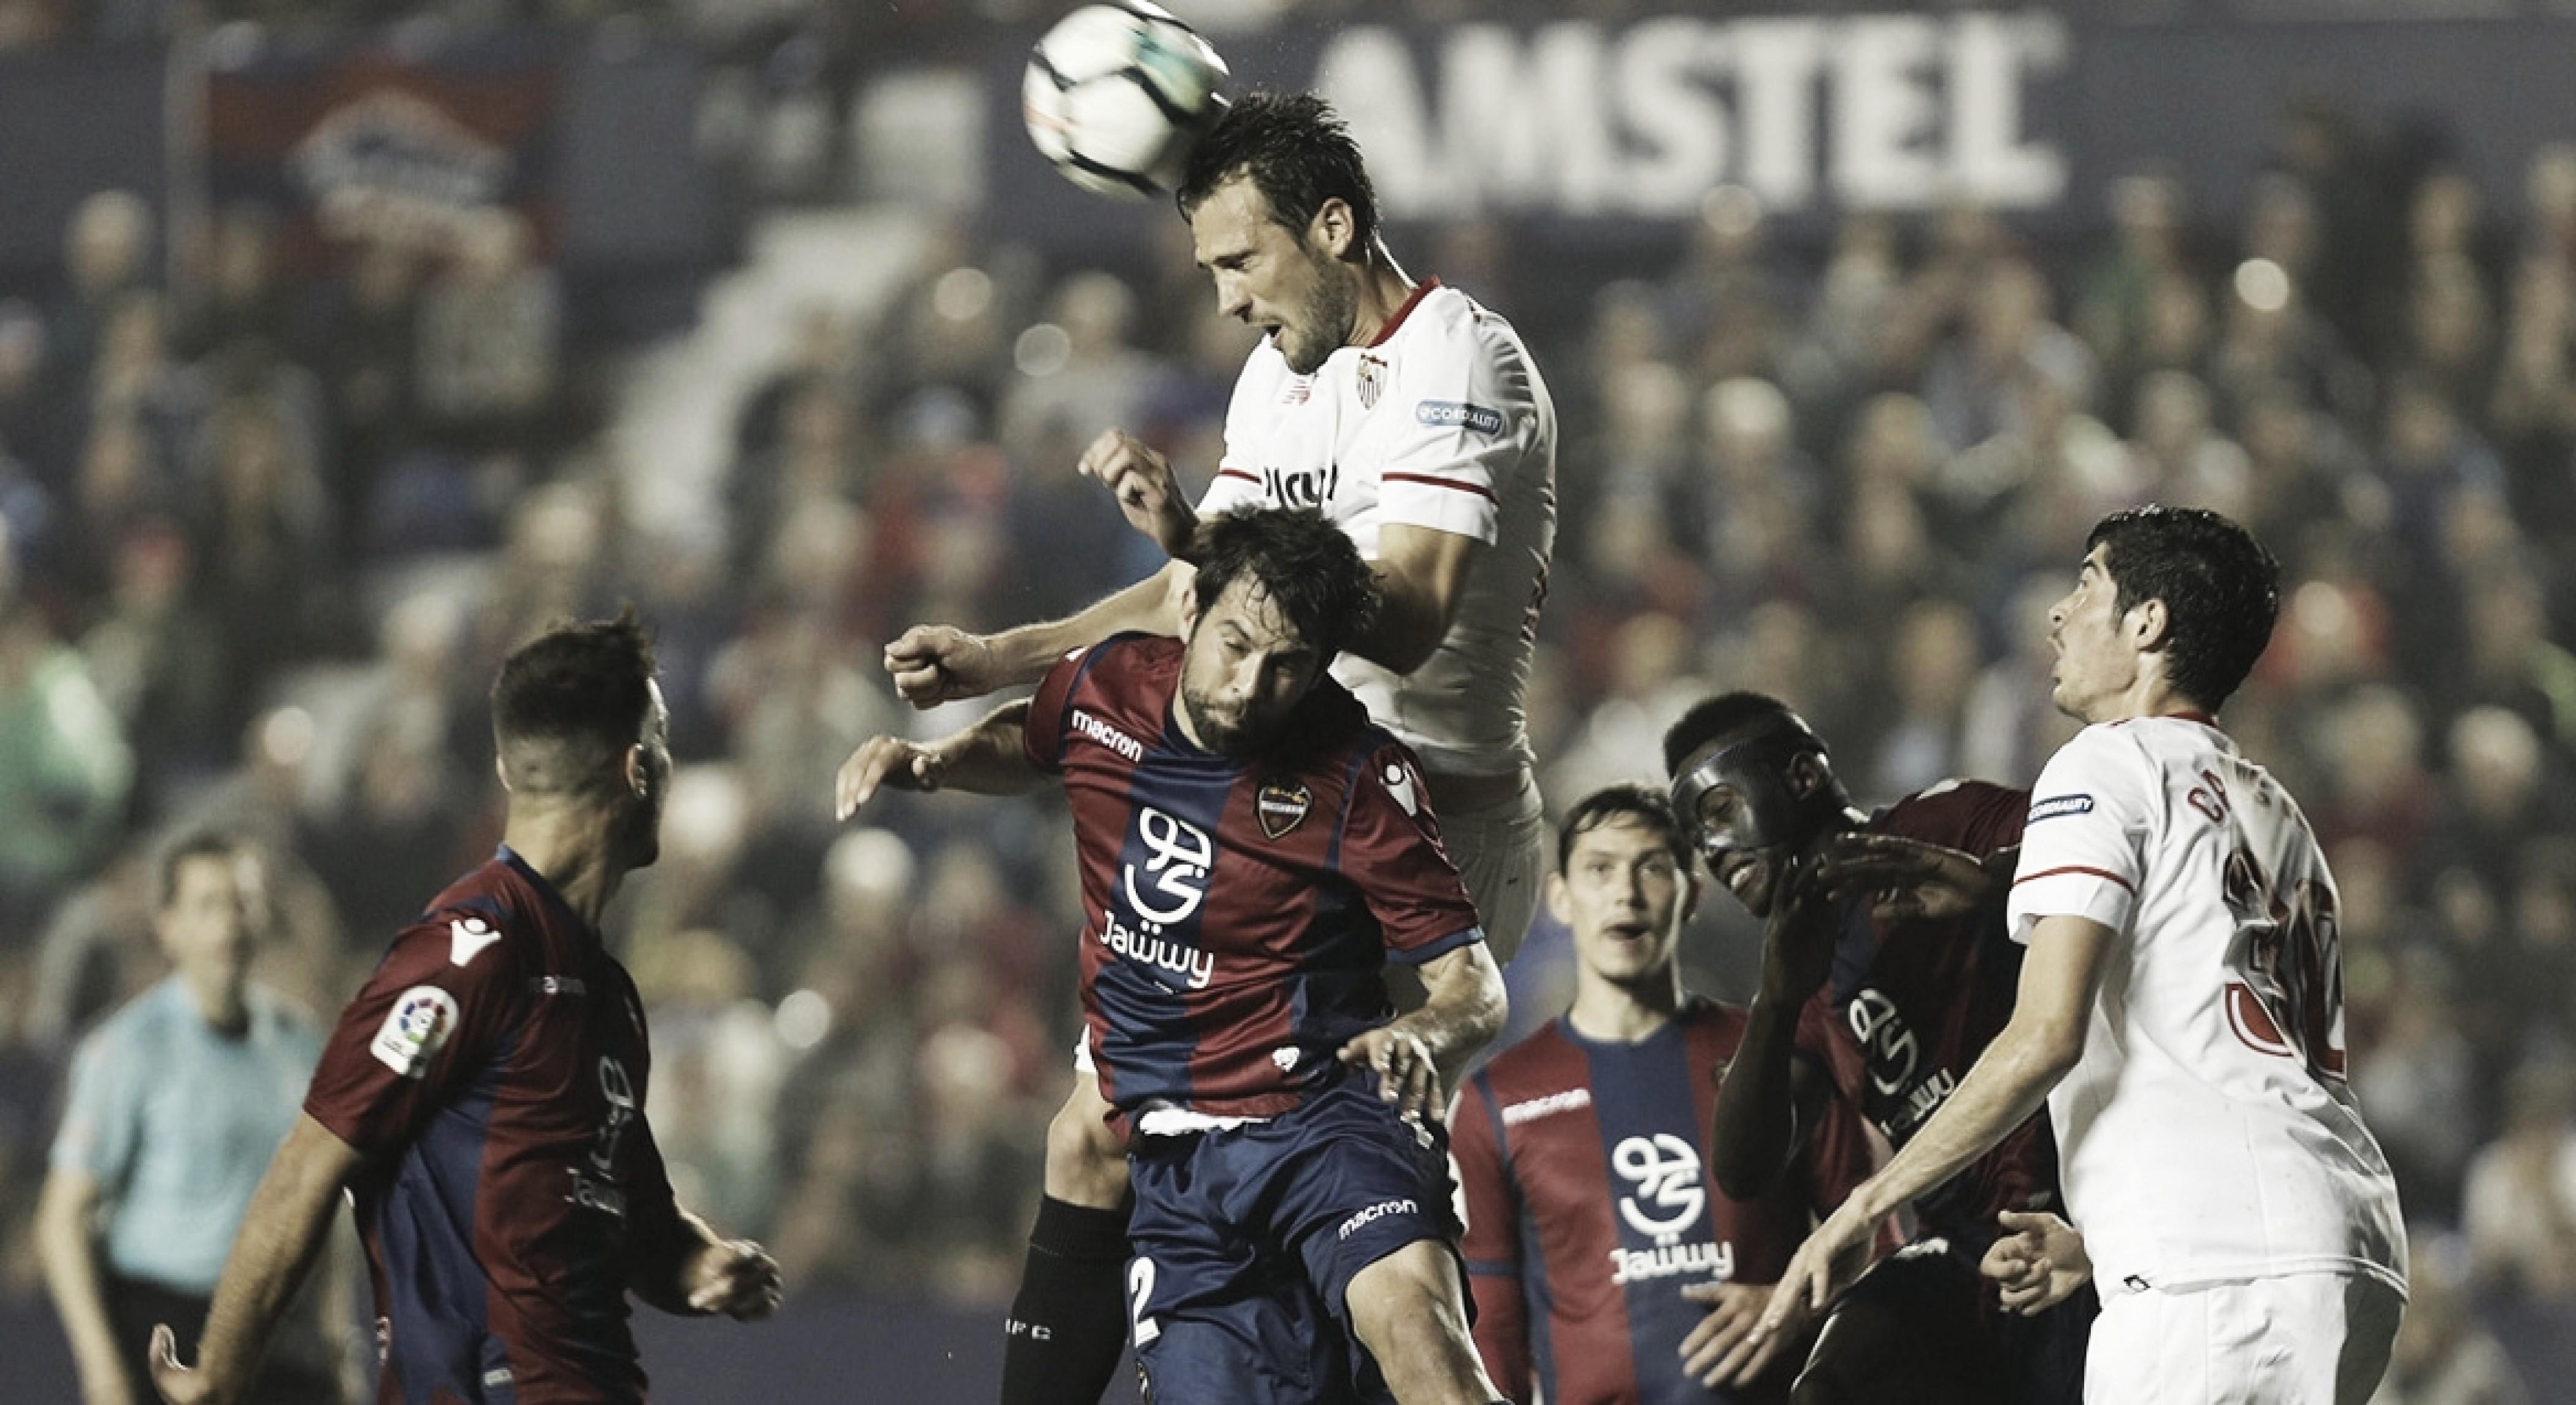 Resumen del Levante UD - Sevilla FC en LaLiga Santander 2018 (2-6)